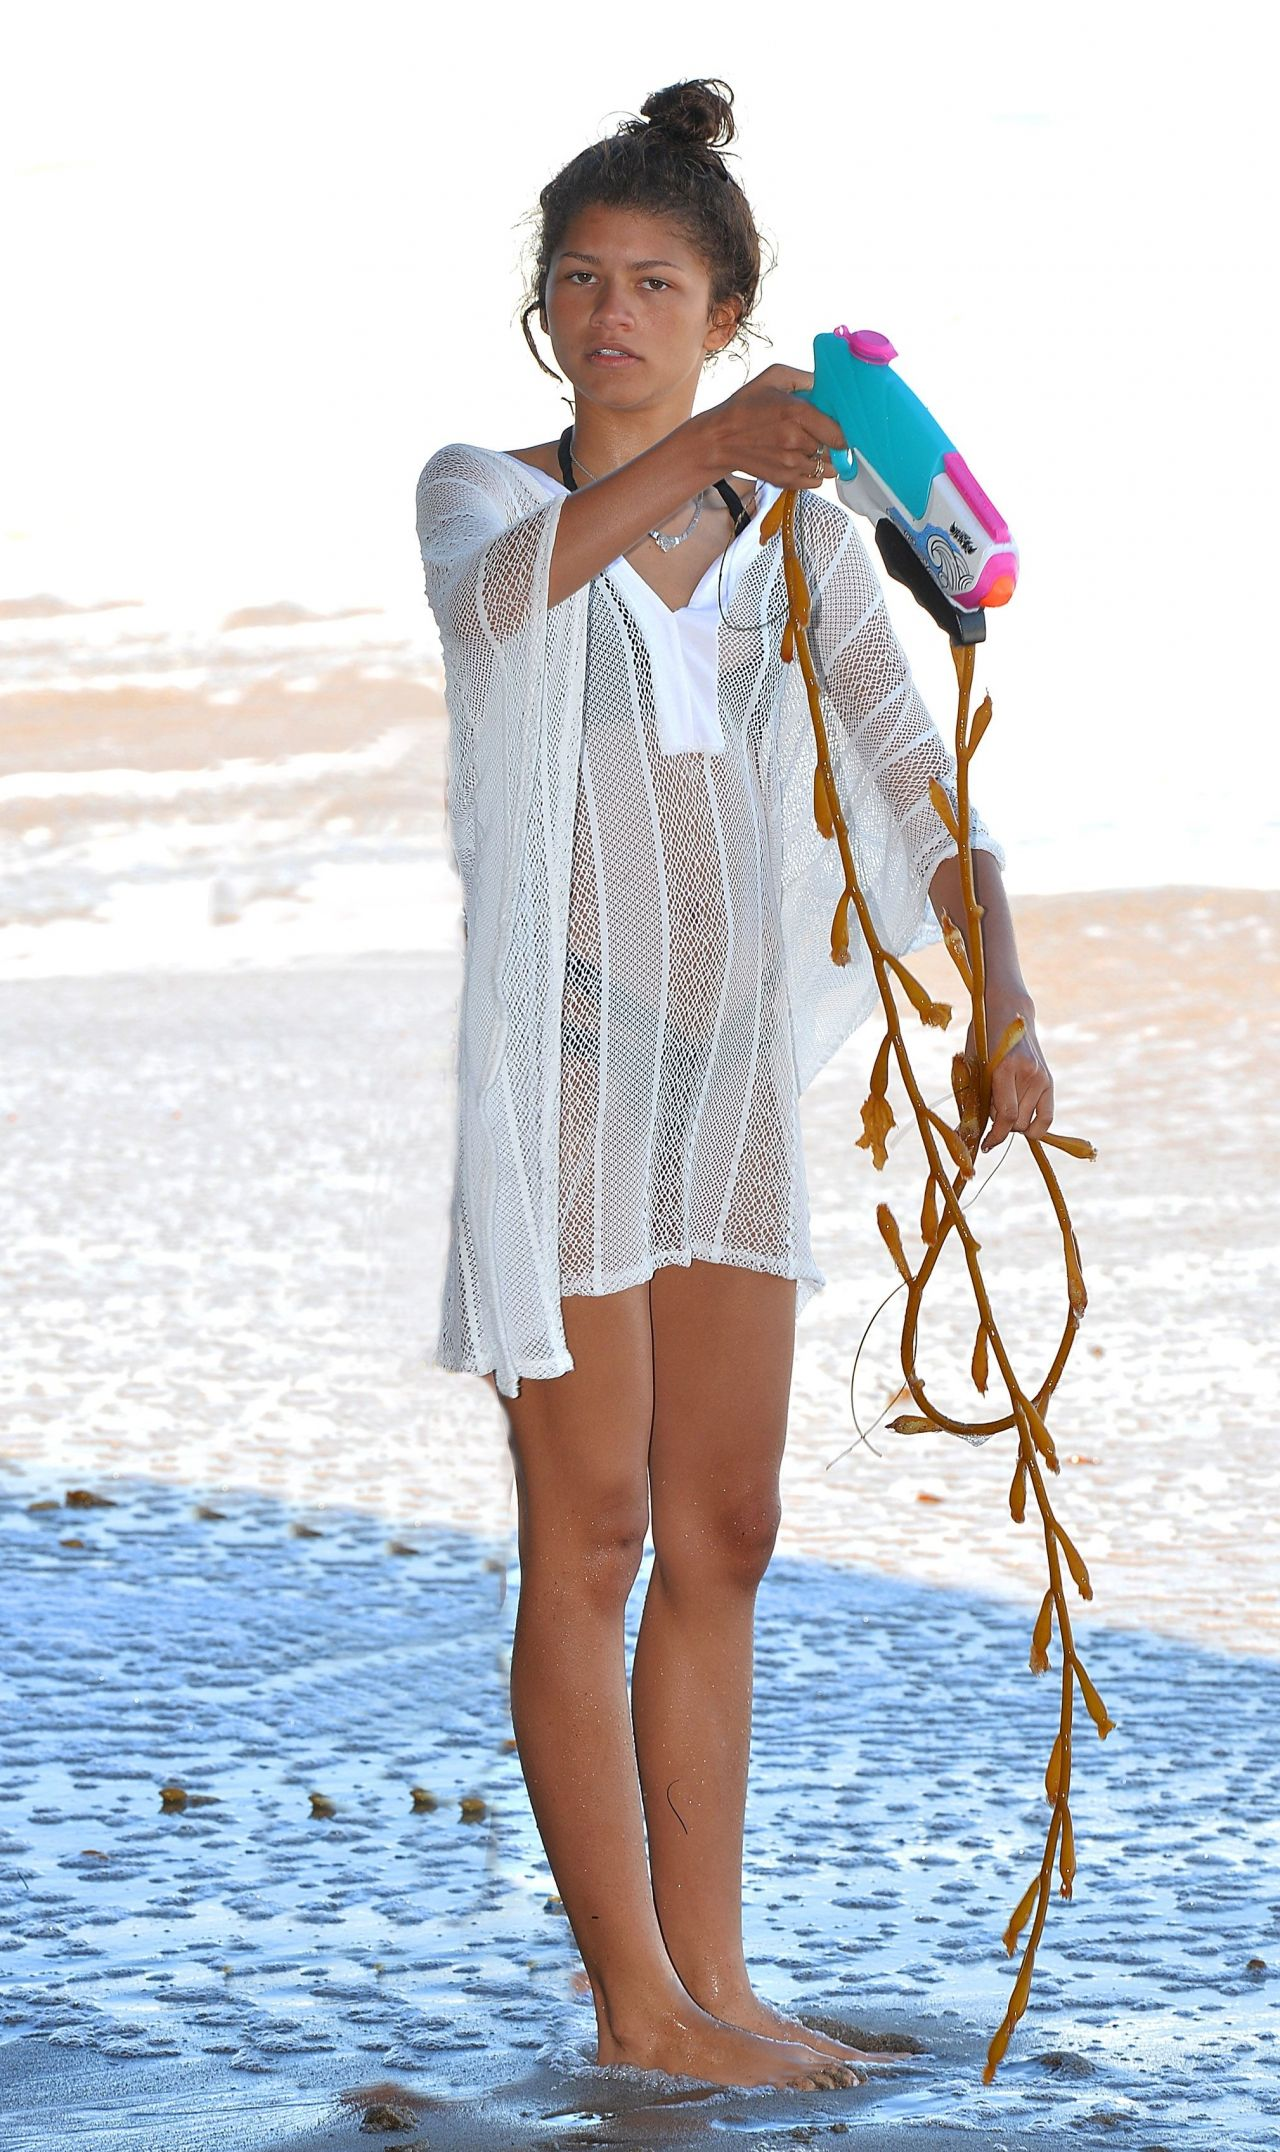 2019 Malibu >> Zendaya Coleman Bikini Candids - Beach in Malibu, July 2014